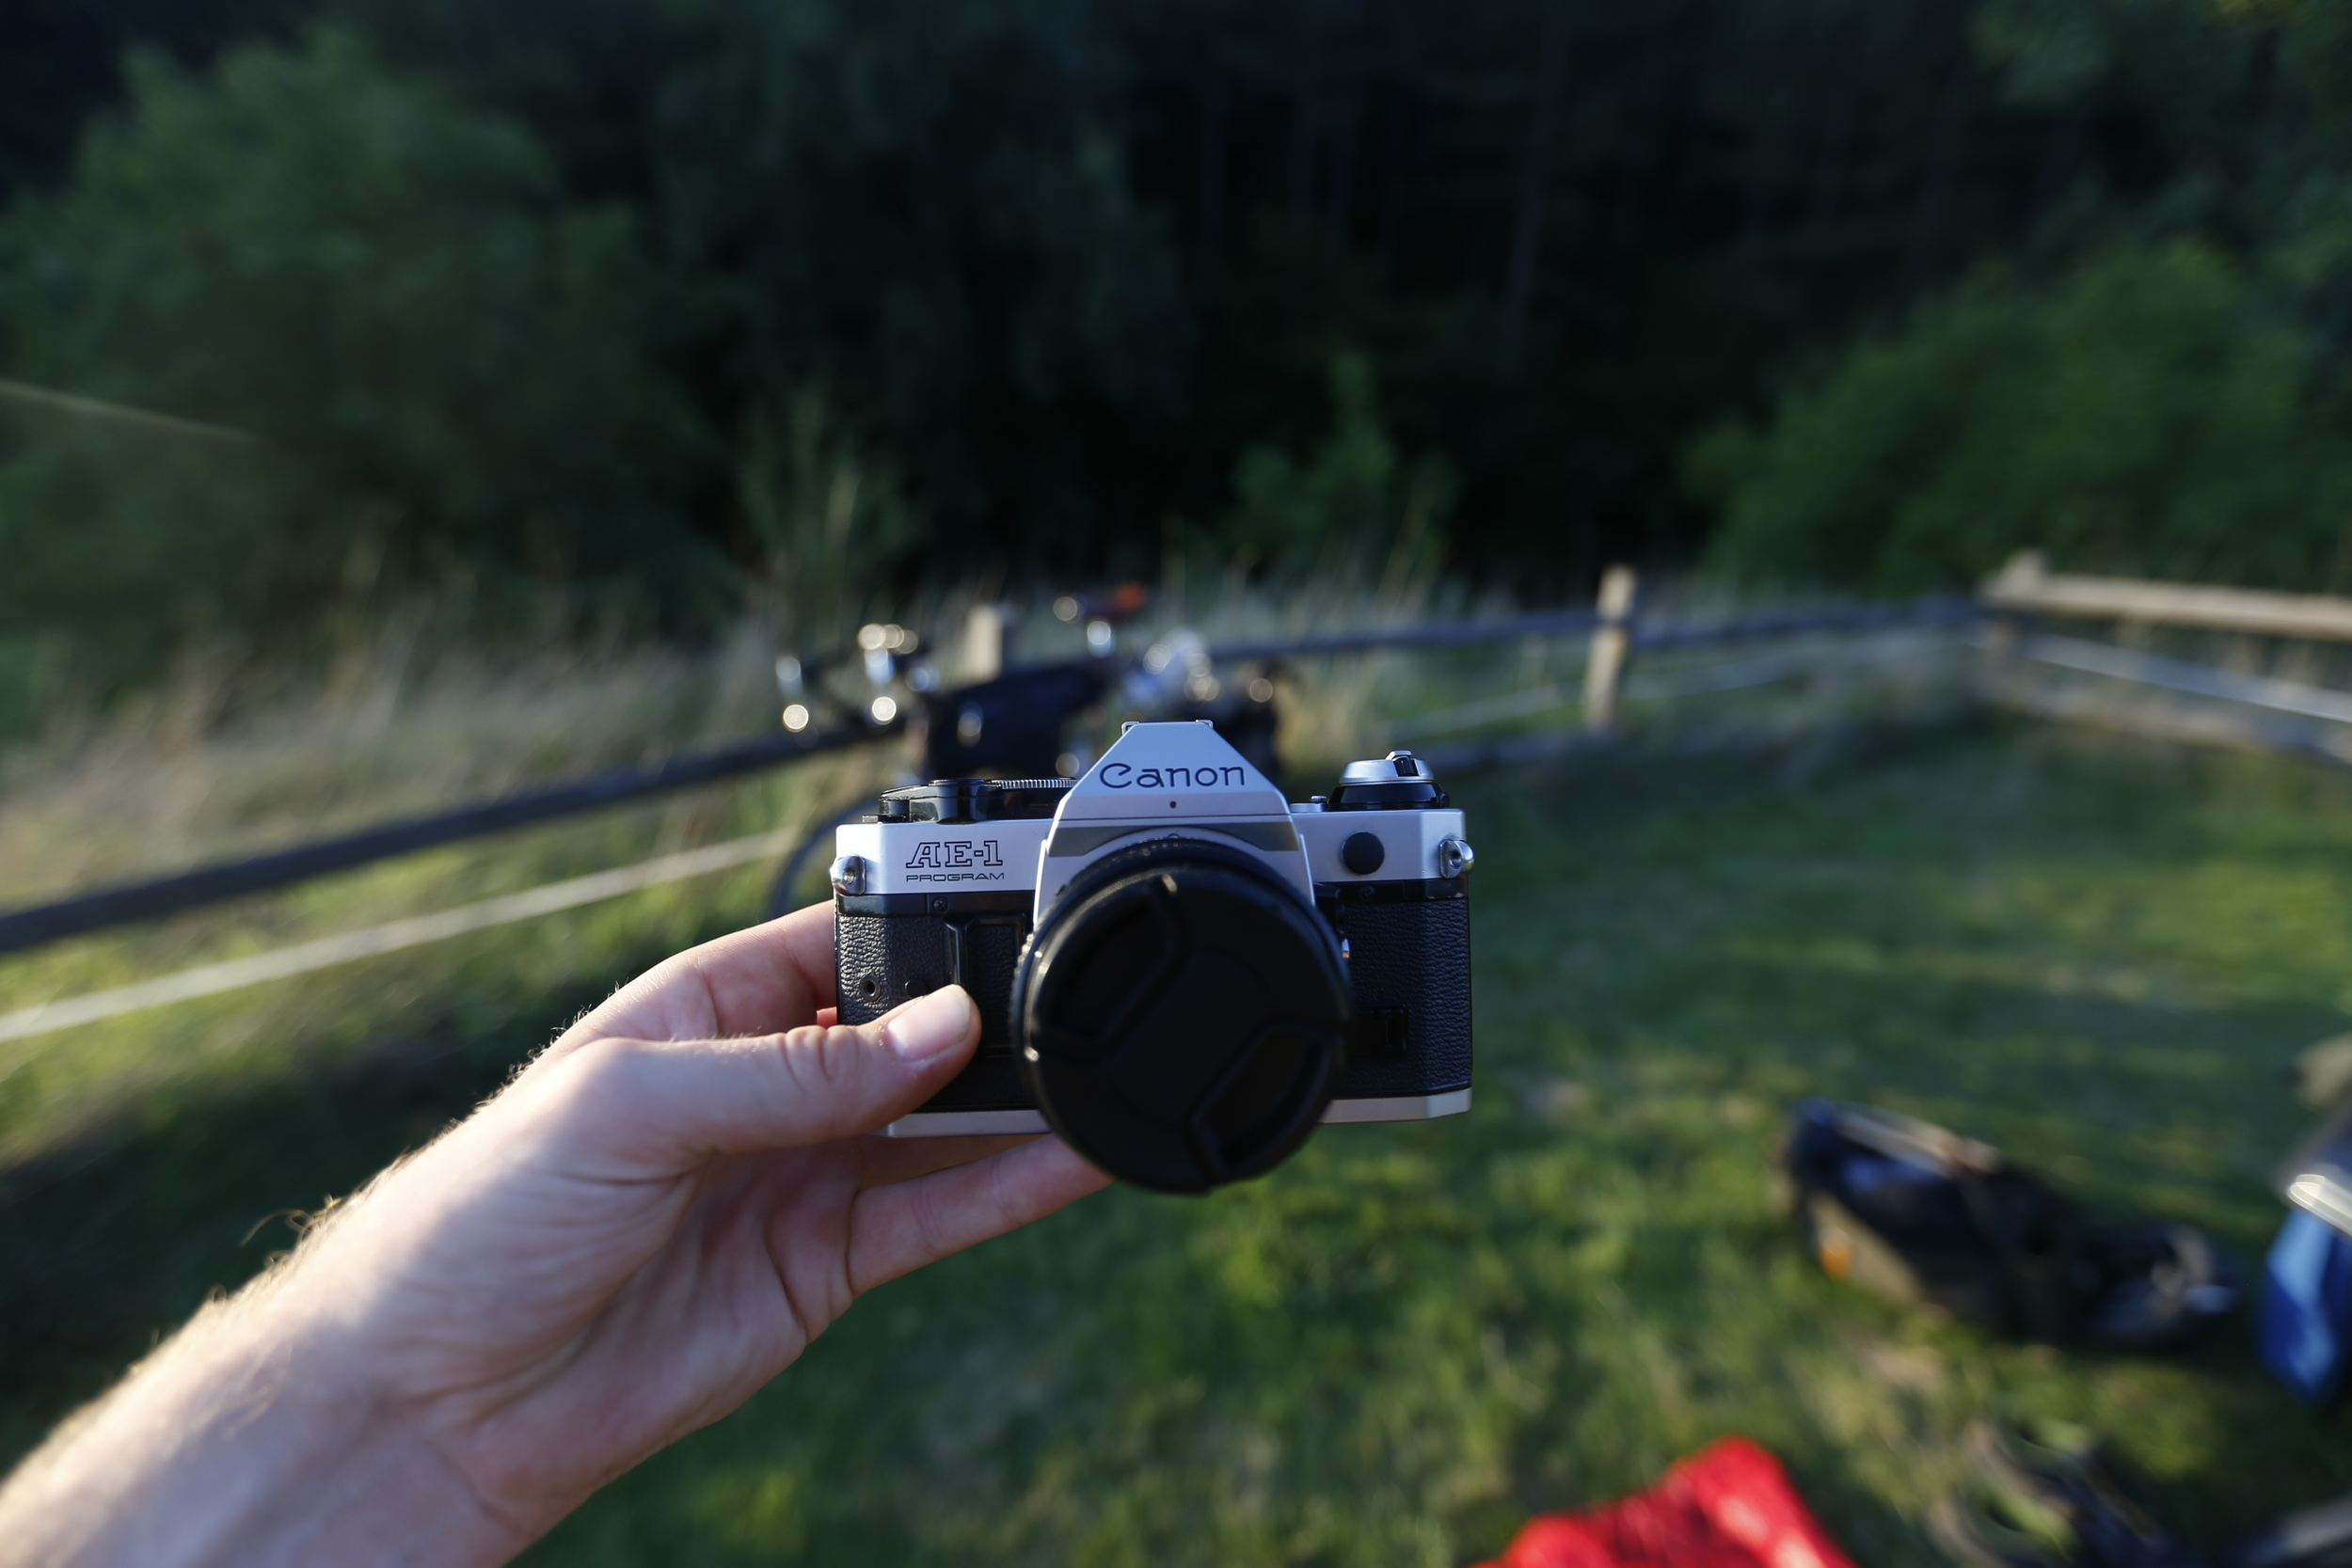 My faithful  Canon AE-1  film camera.